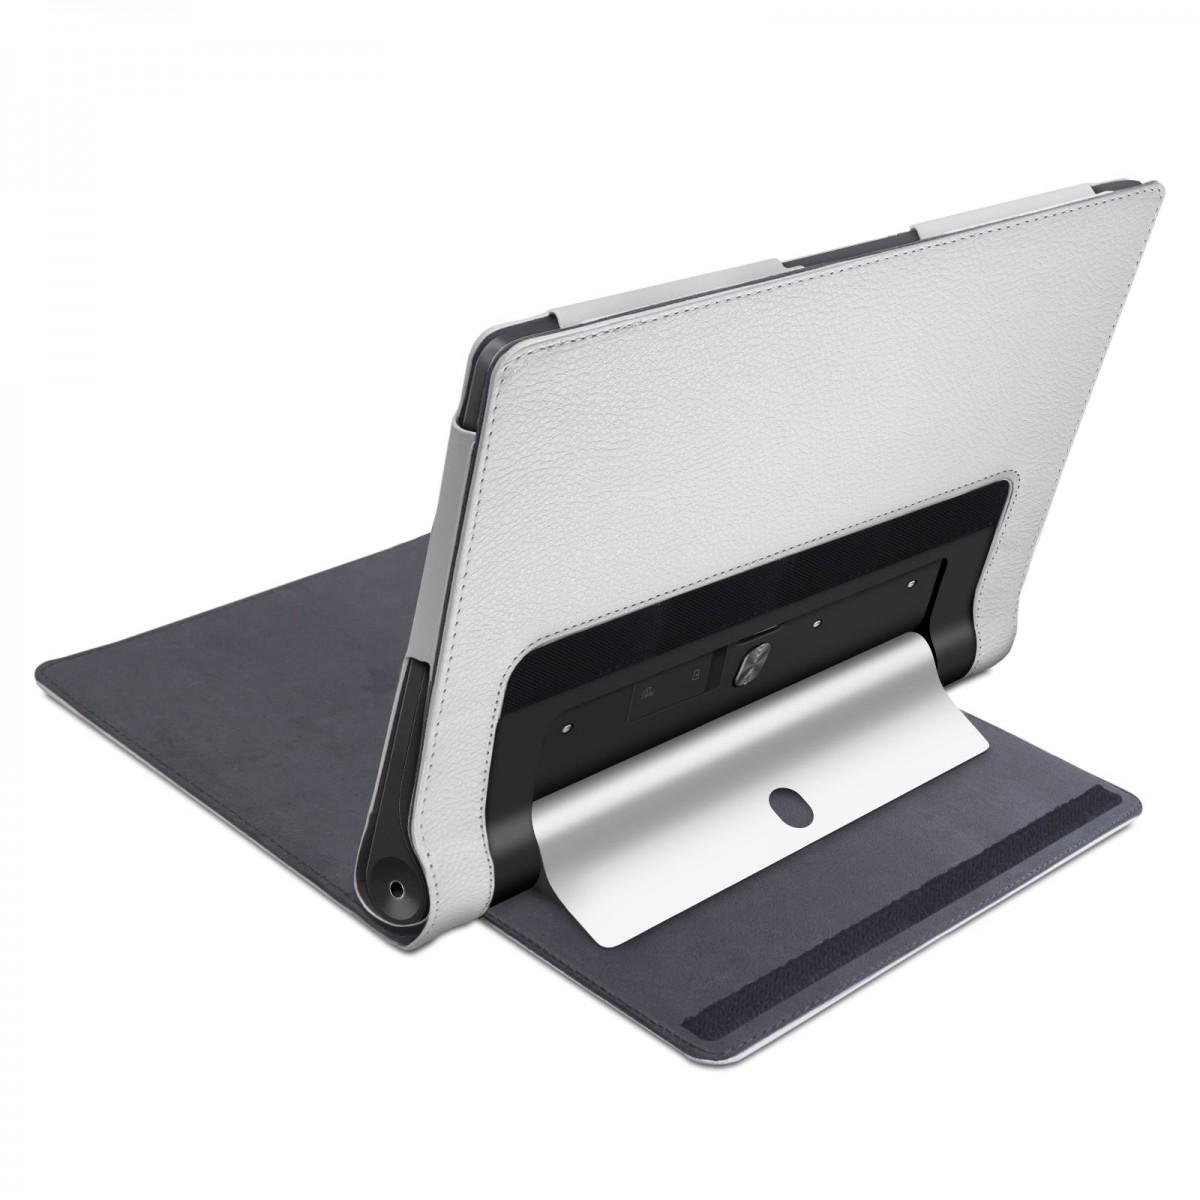 efabrik schutzh lle f r lenovo yoga 3 8 zoll case tablet